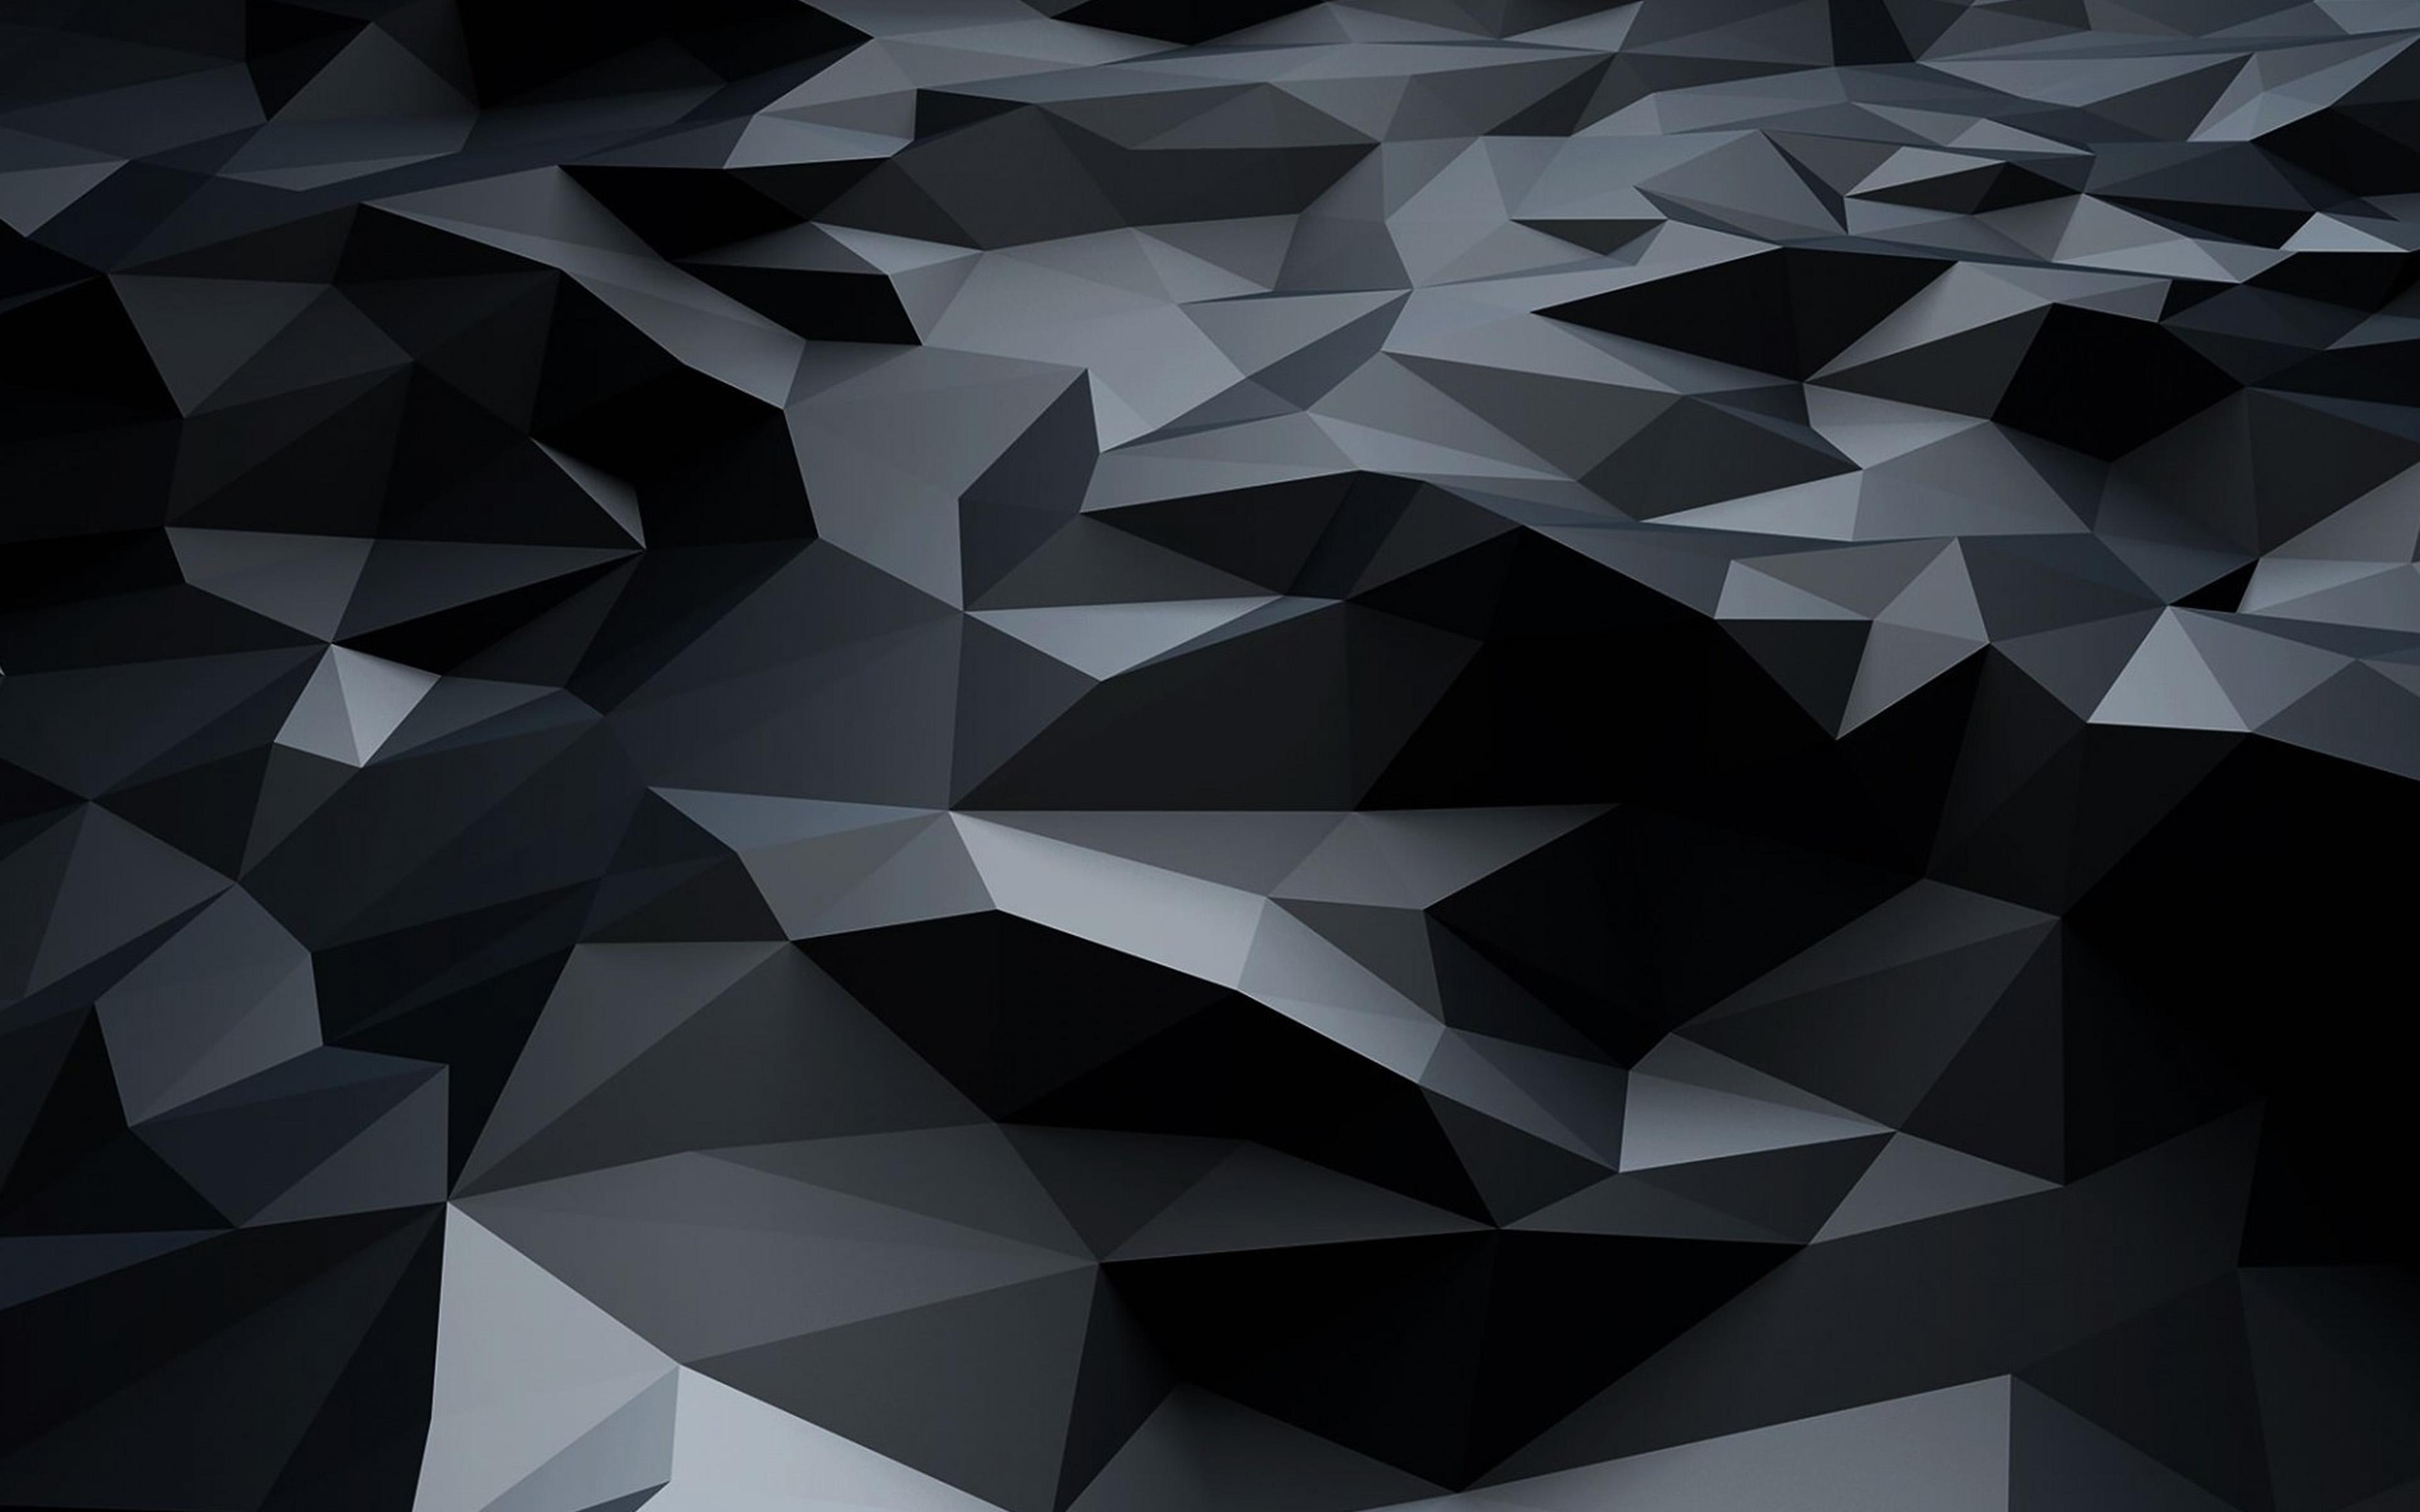 Vj27 Low Poly Art Dark Pattern